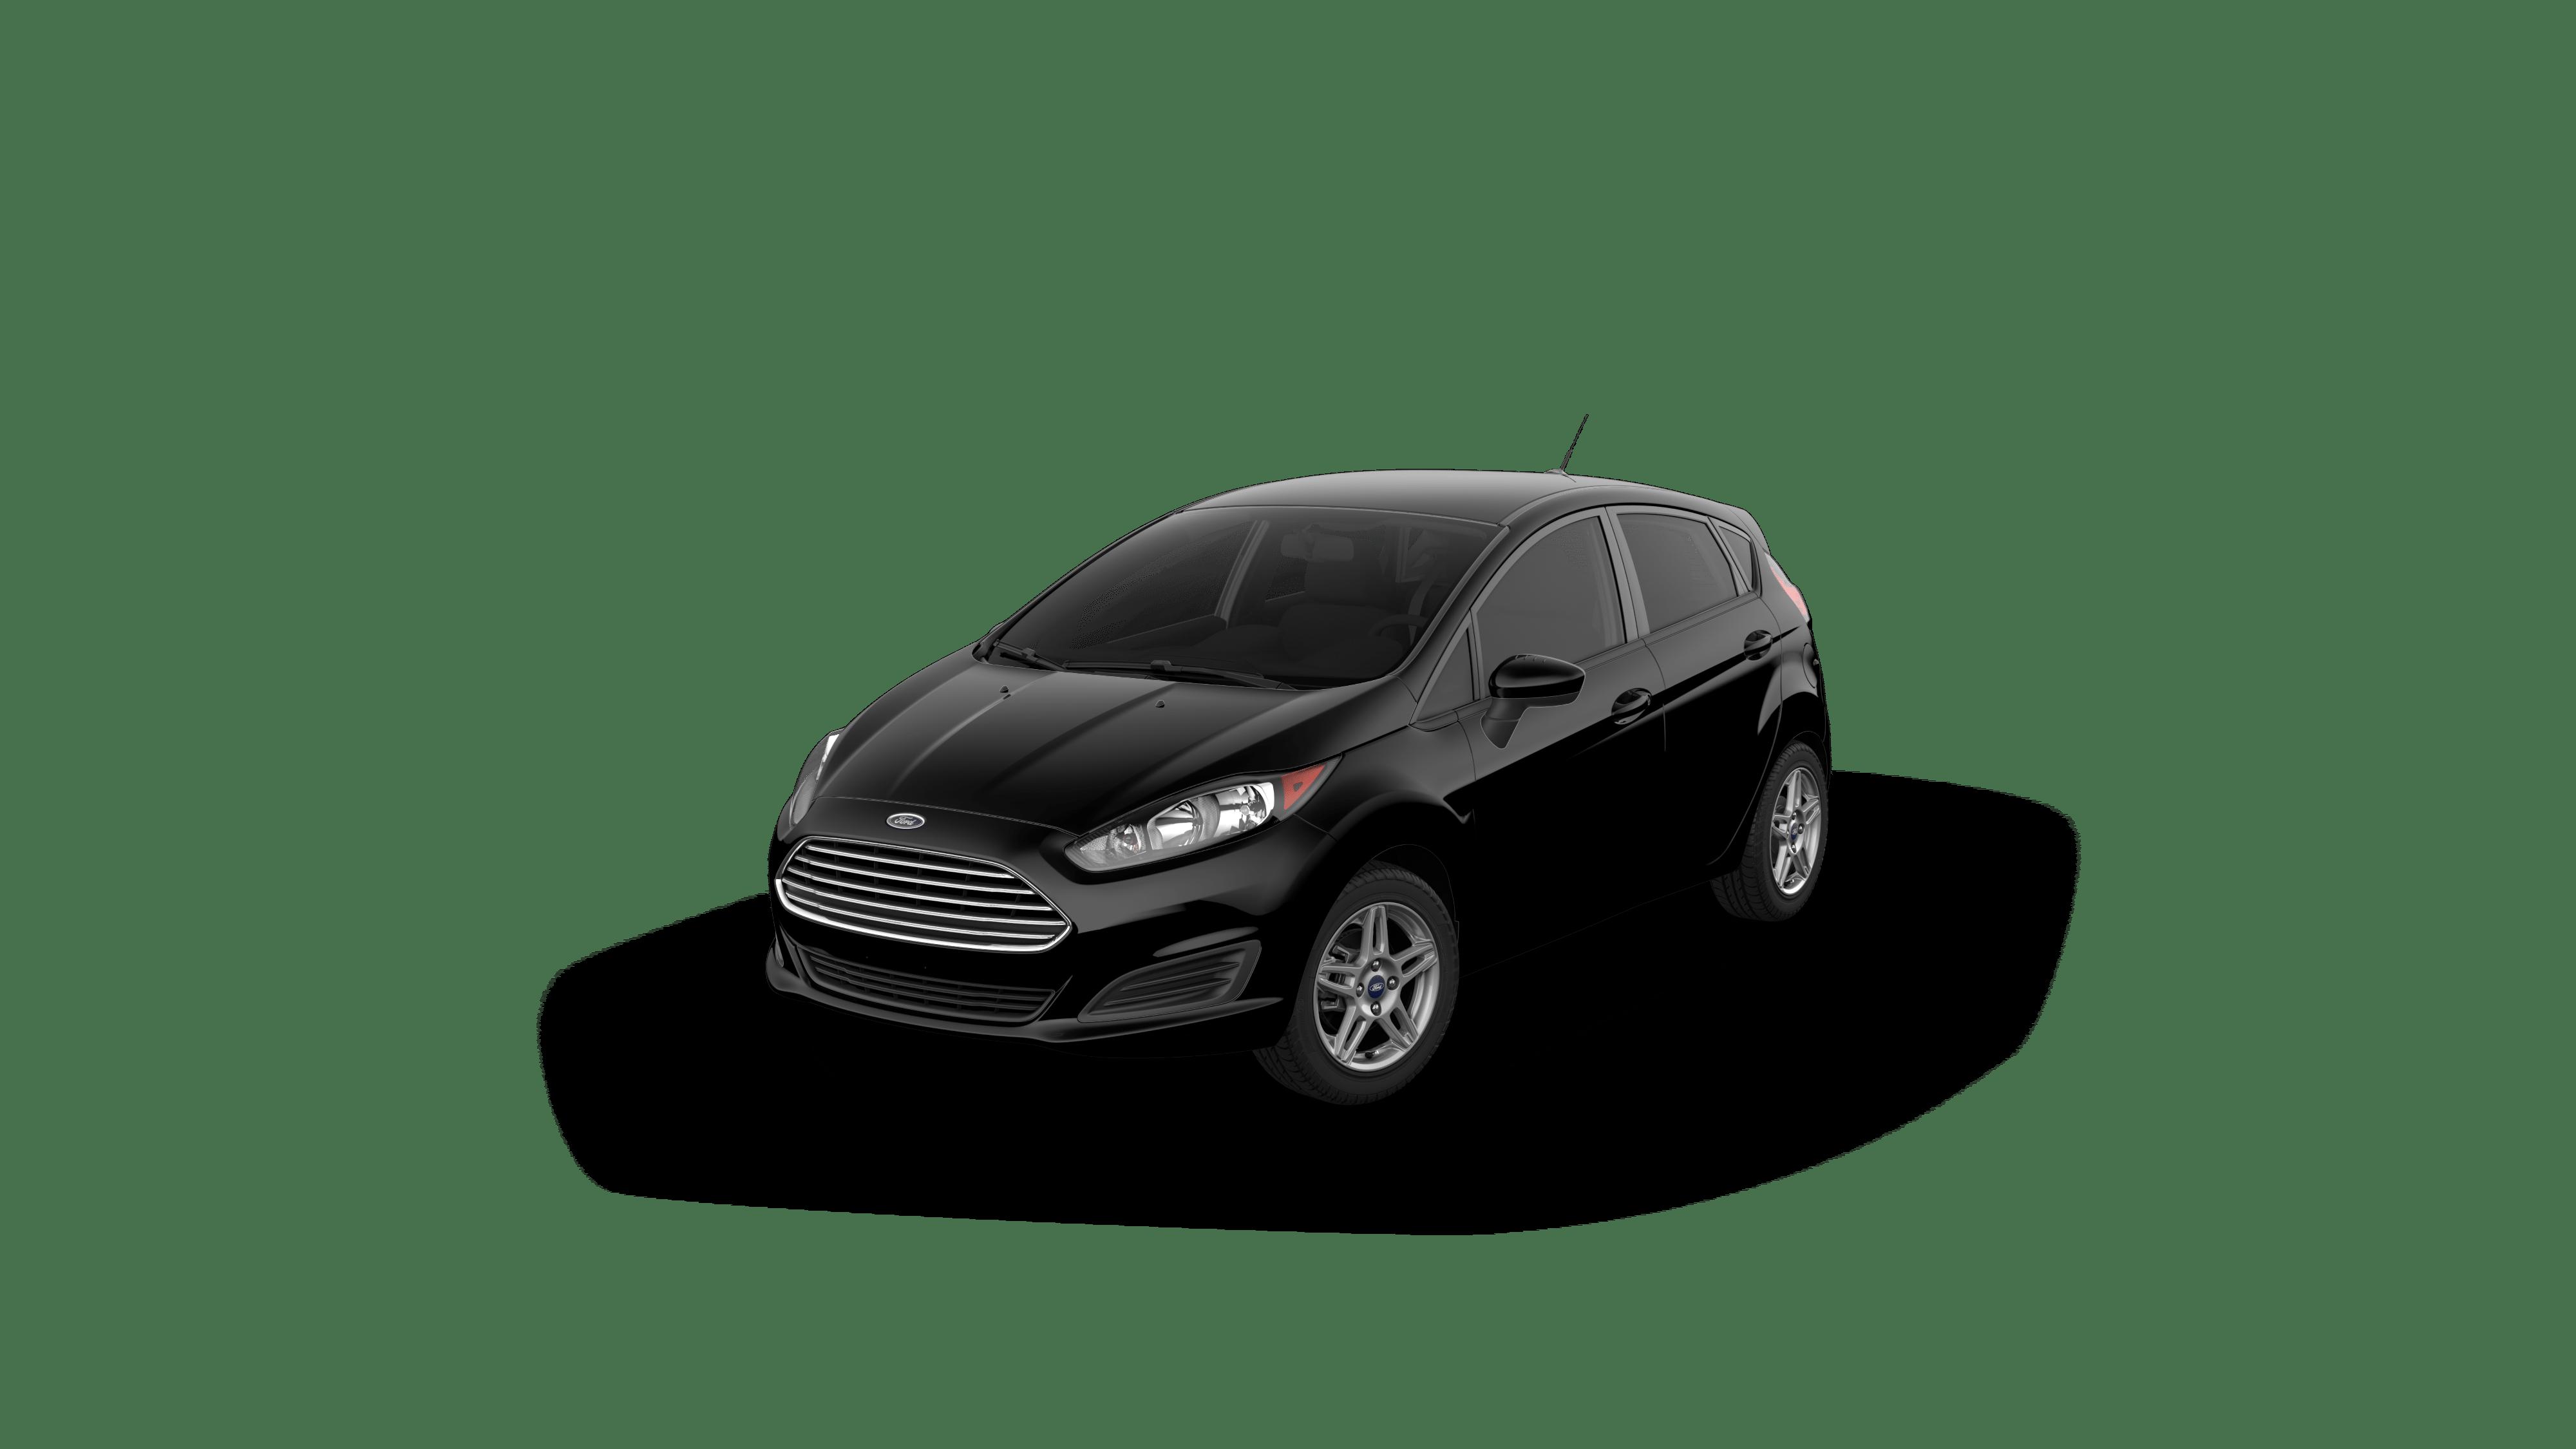 2018 Ford Fiesta Vehicle Photo in Souderton, PA 18964-1038